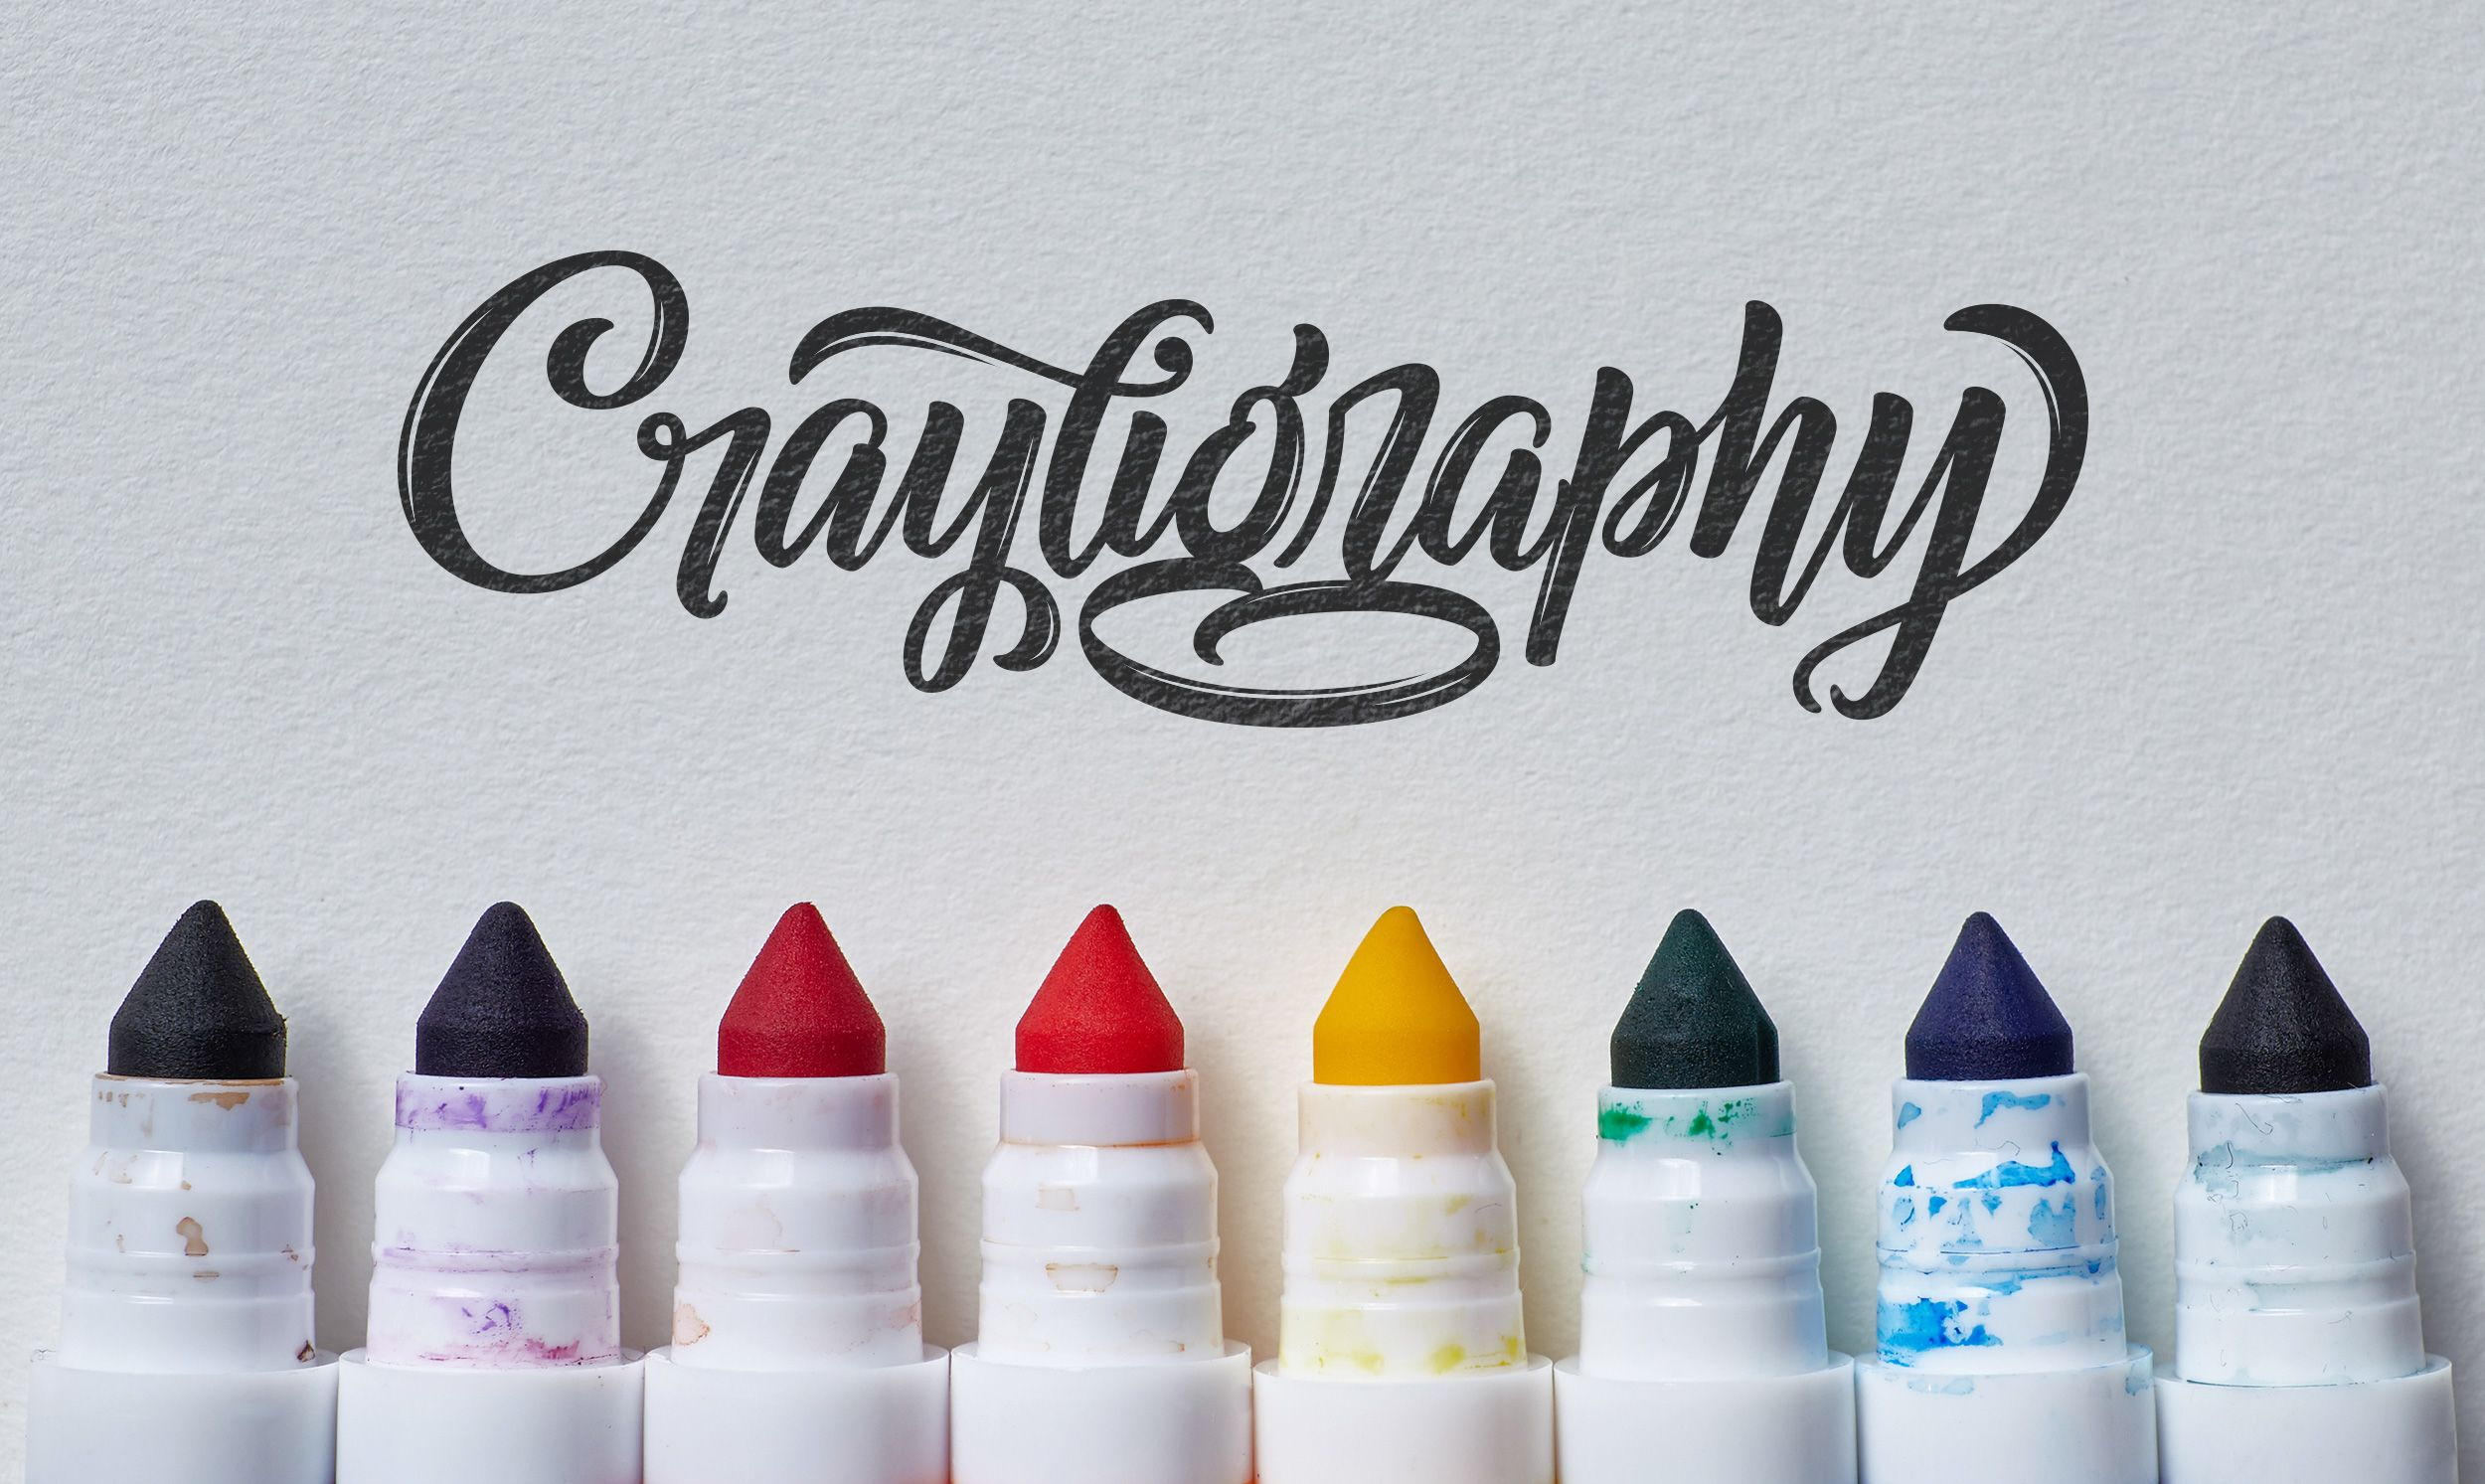 Crazy Crayola Calligraphy